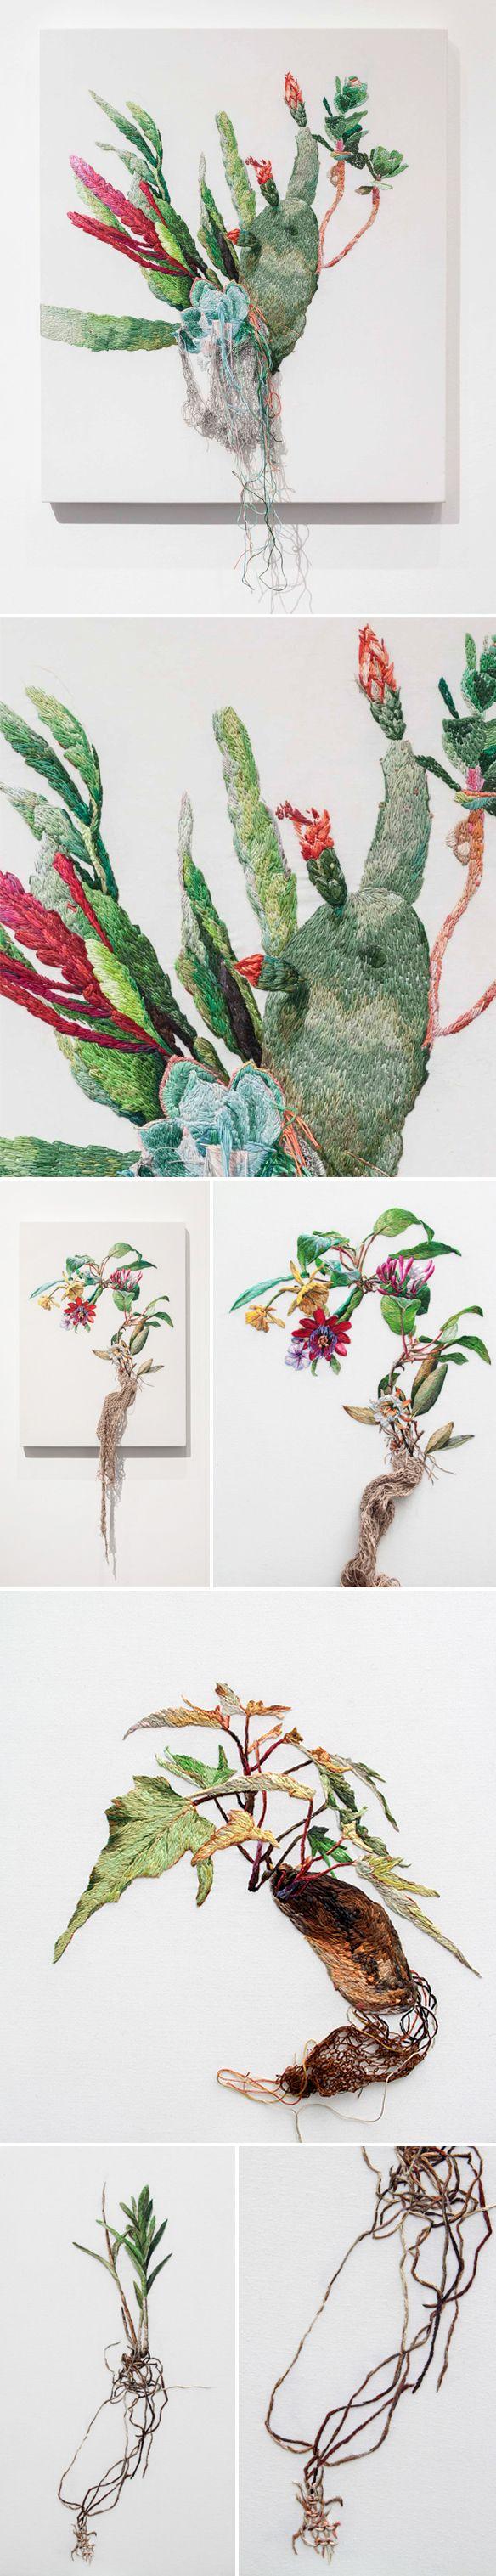 embroidery by ana teresa barboza <3